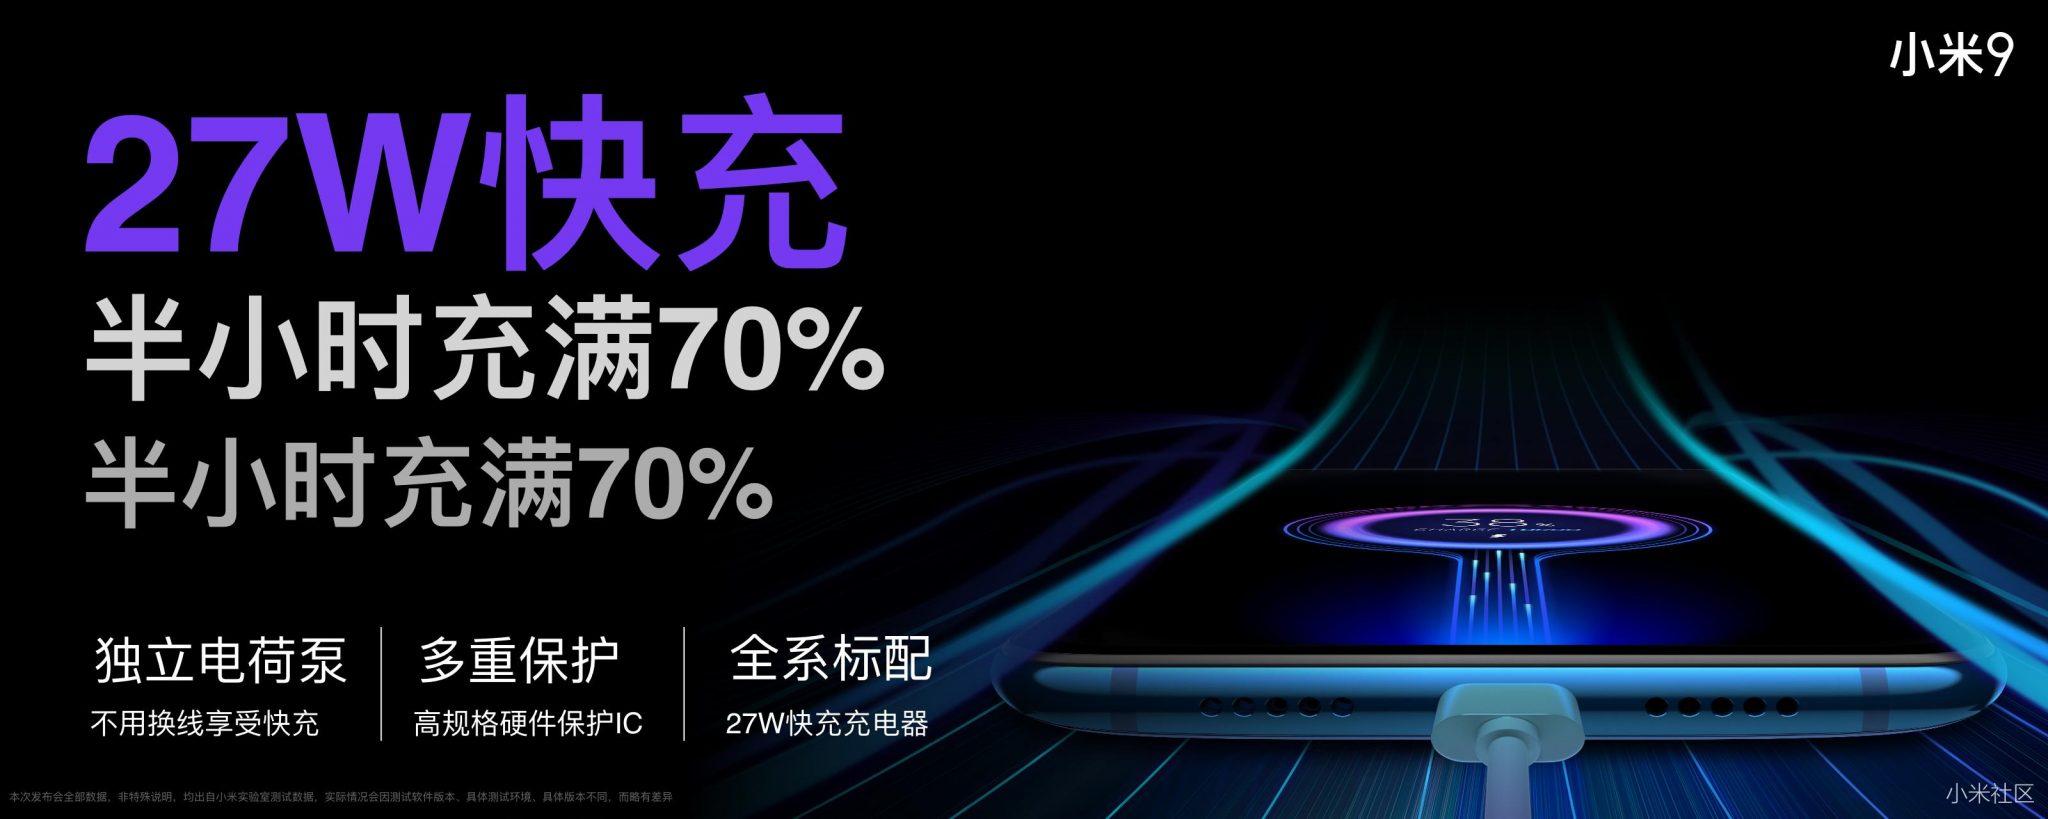 Xiaomi Mi 9 price in nepal